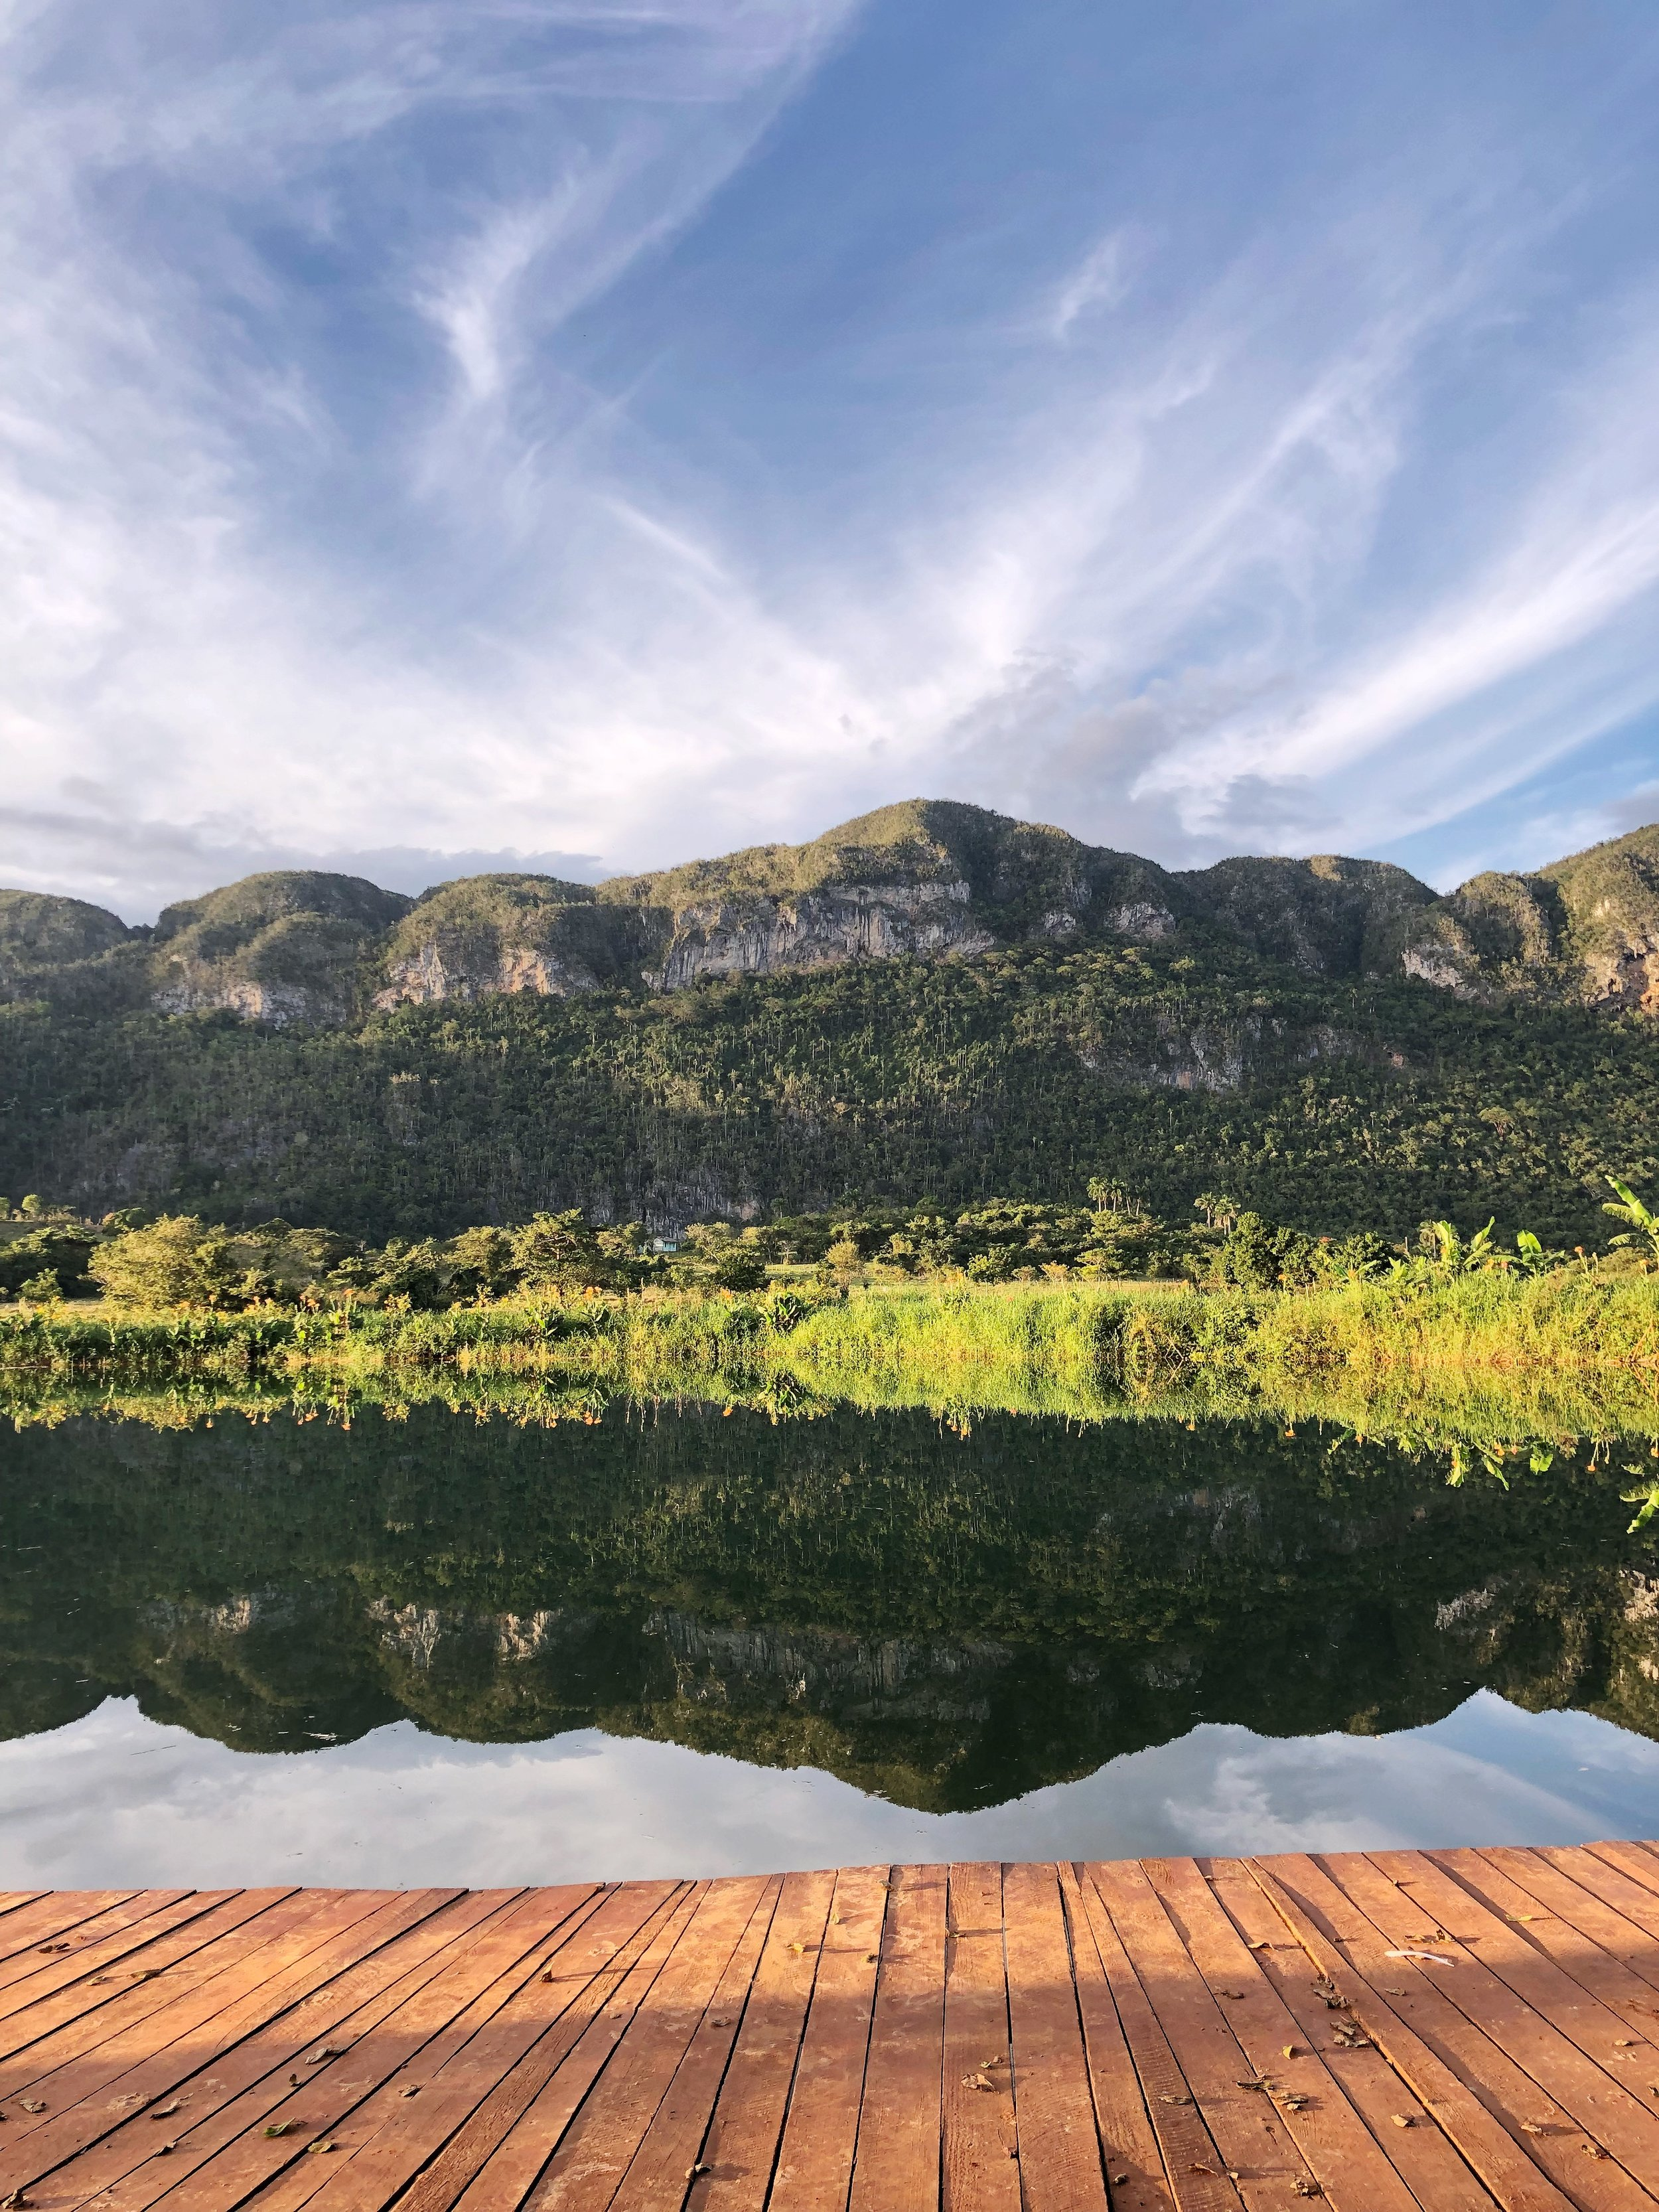 A natural lake--honestly so amazingly beautiful